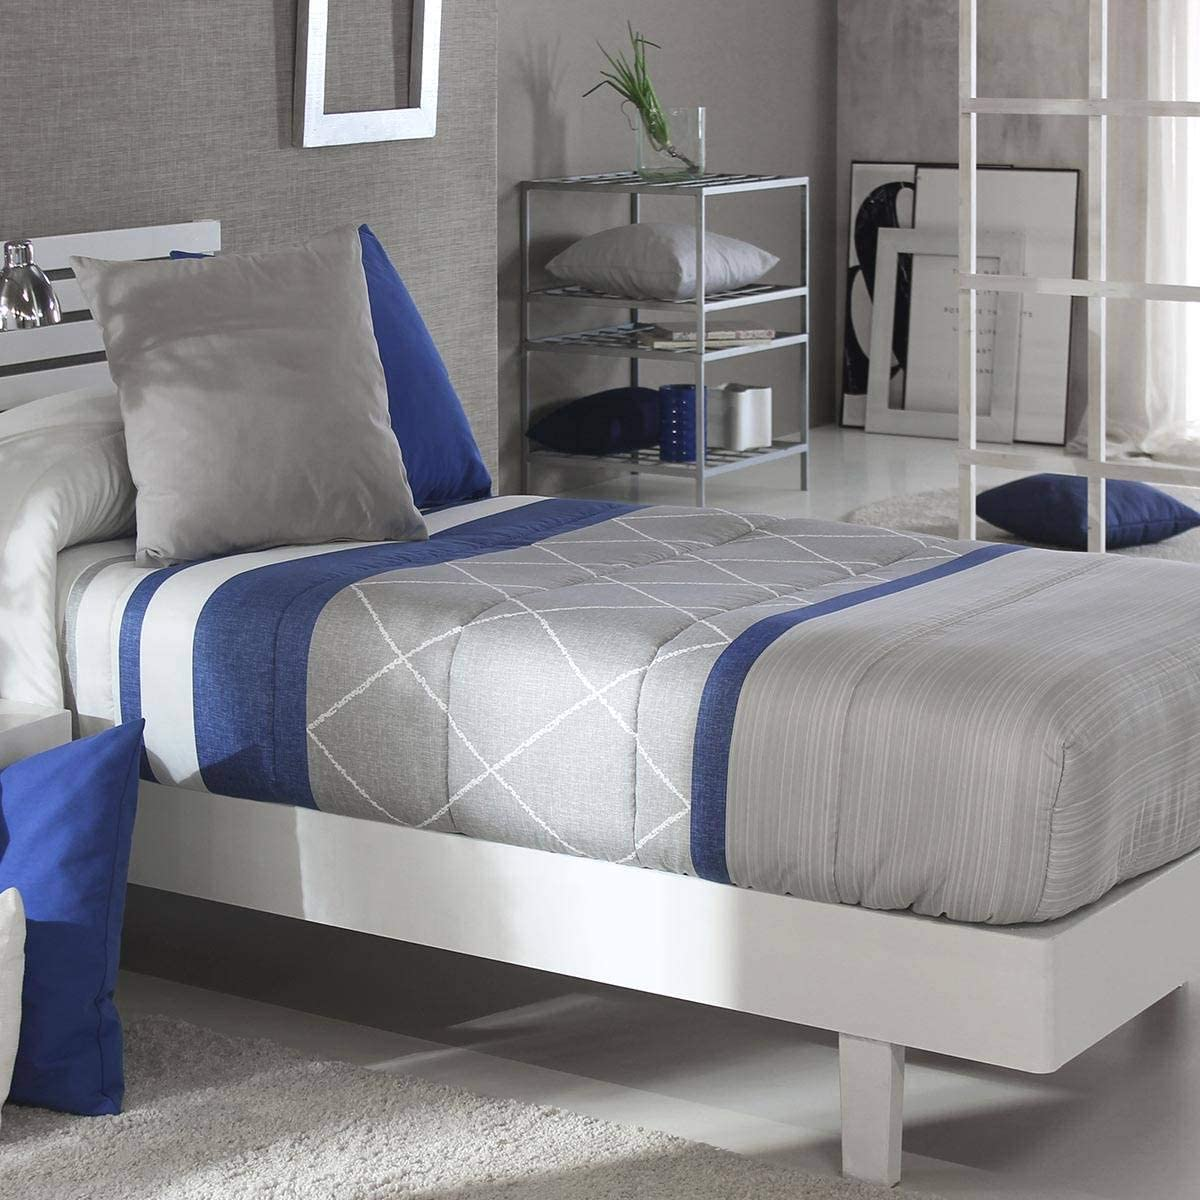 Color Azul C03 Cama 90 Cm Edred/ón Ajustable Wang AG Reig Marti